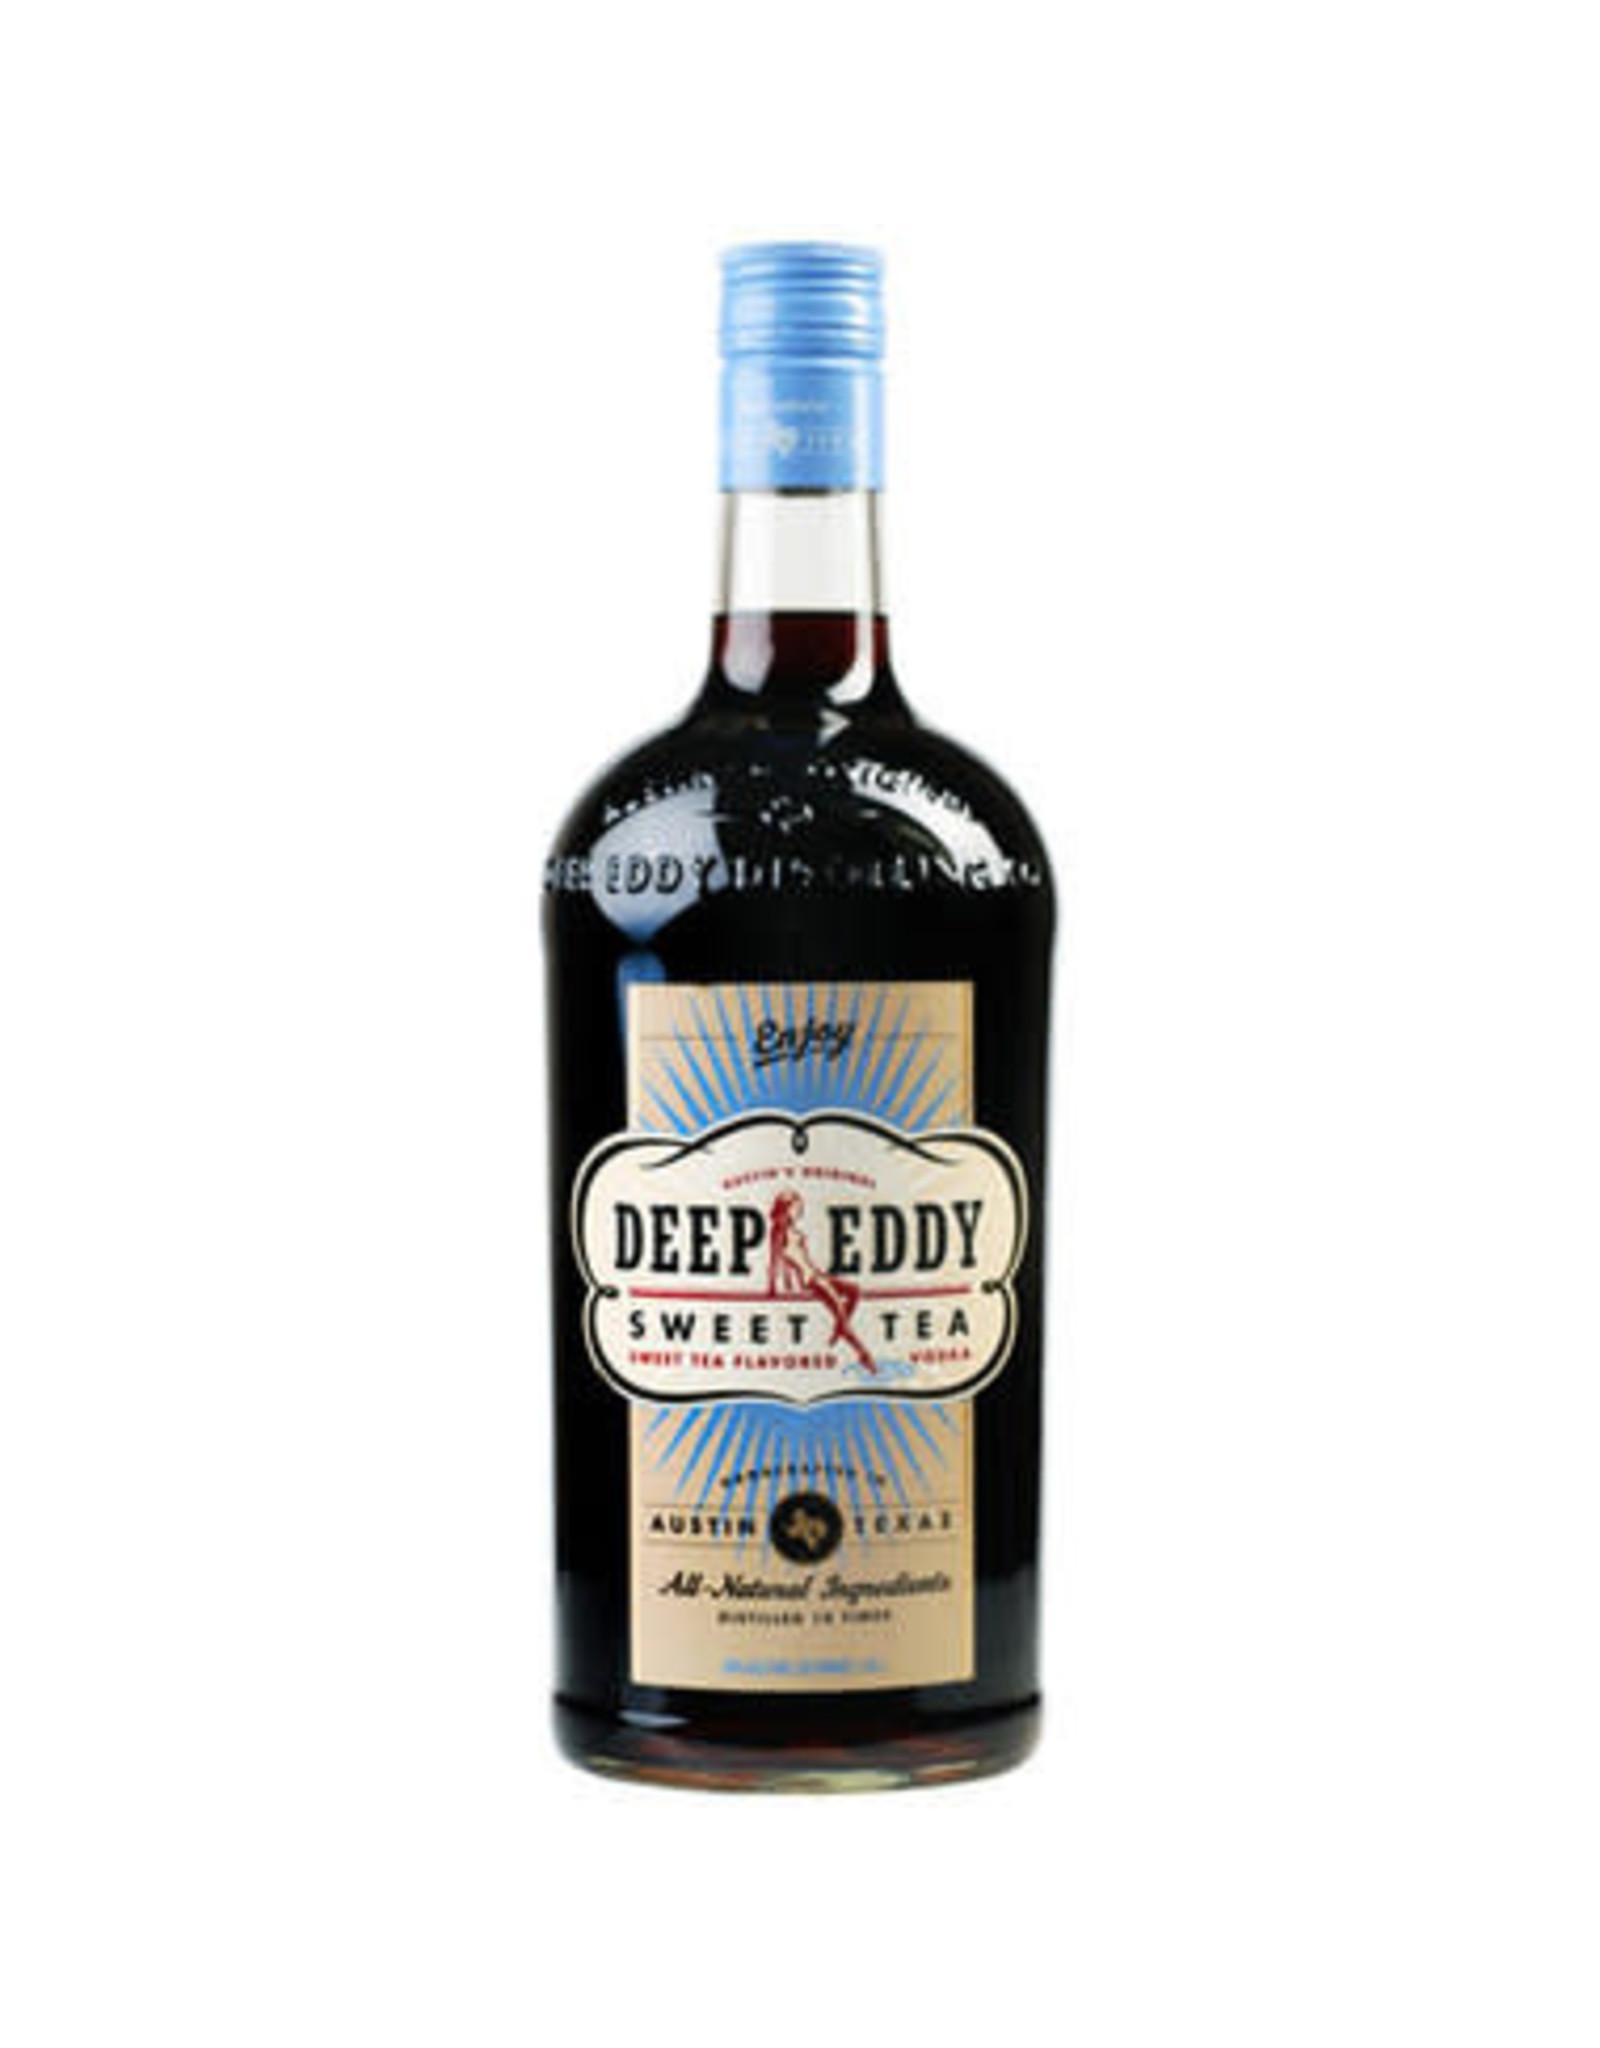 DEEP EDDY SWEET TEA VODKA 1.75L